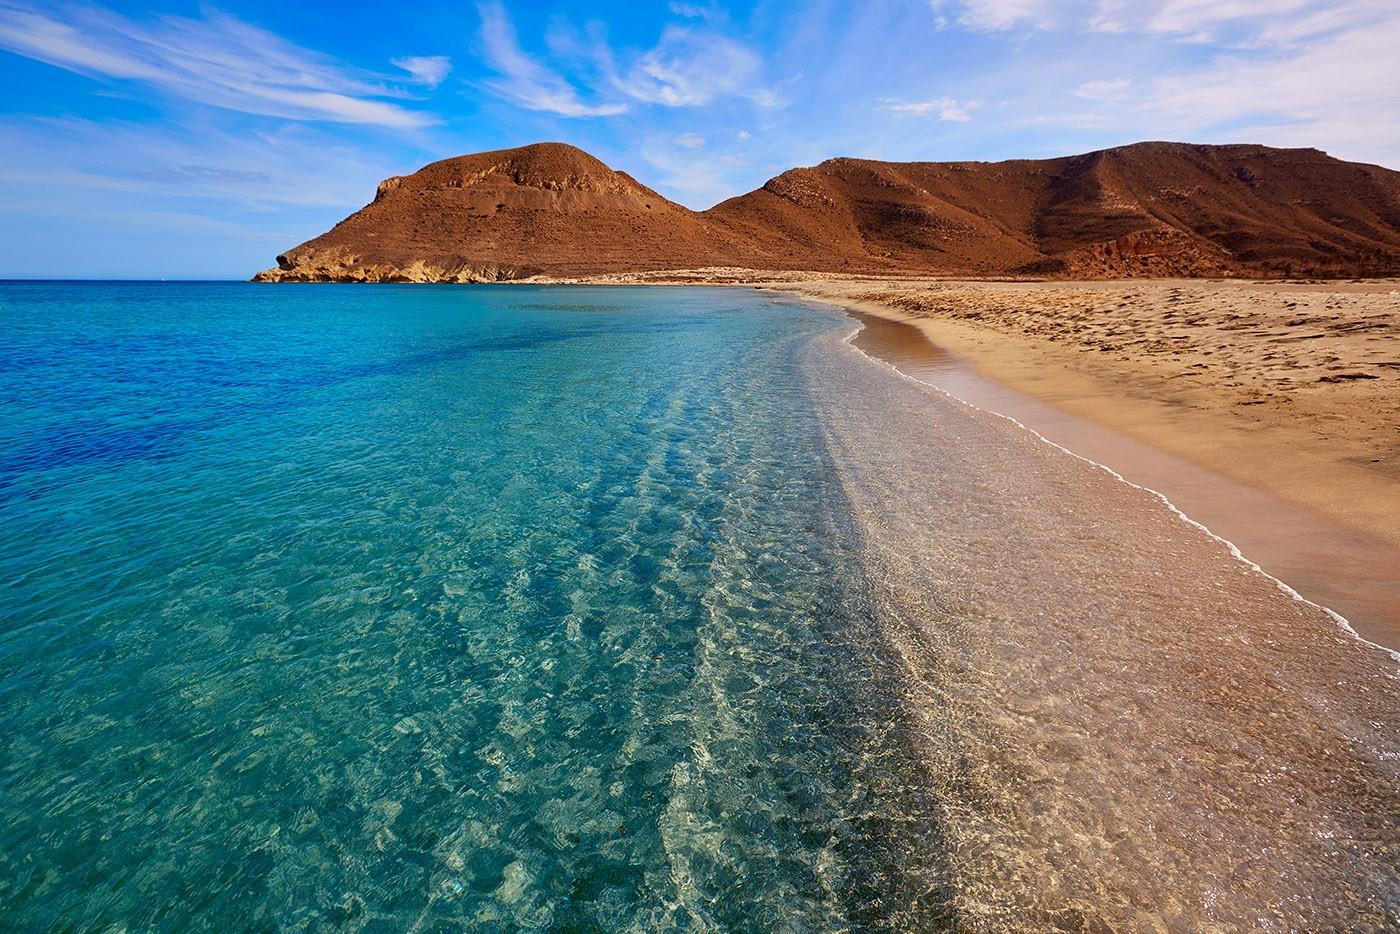 Plage Rodalquilar, Cabo de Gata, Andalousie